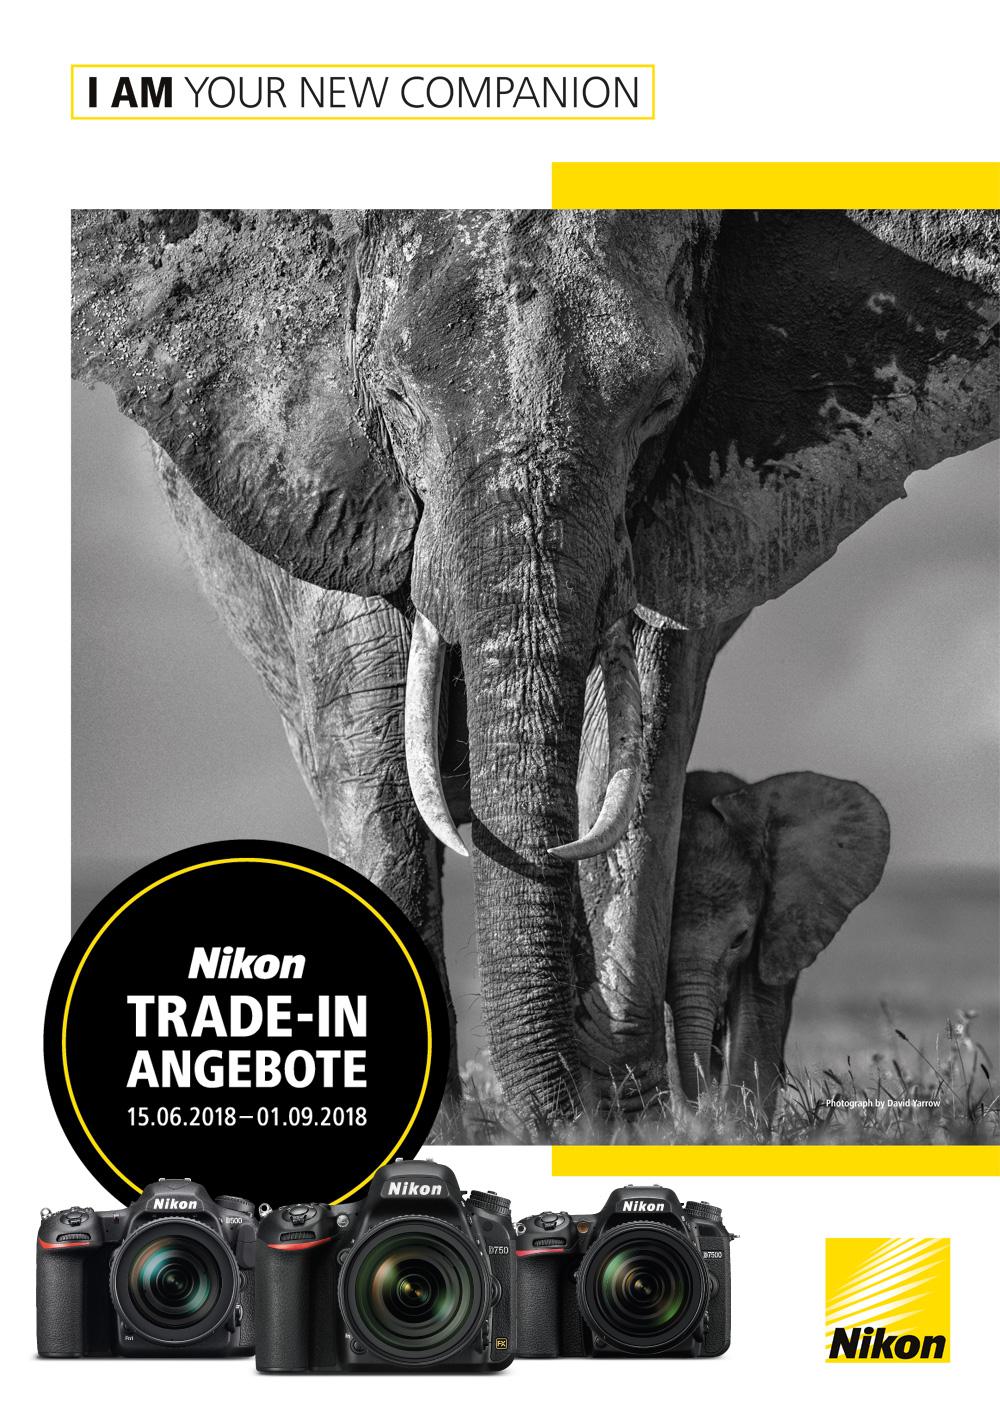 Nikon Trade-in Angebote